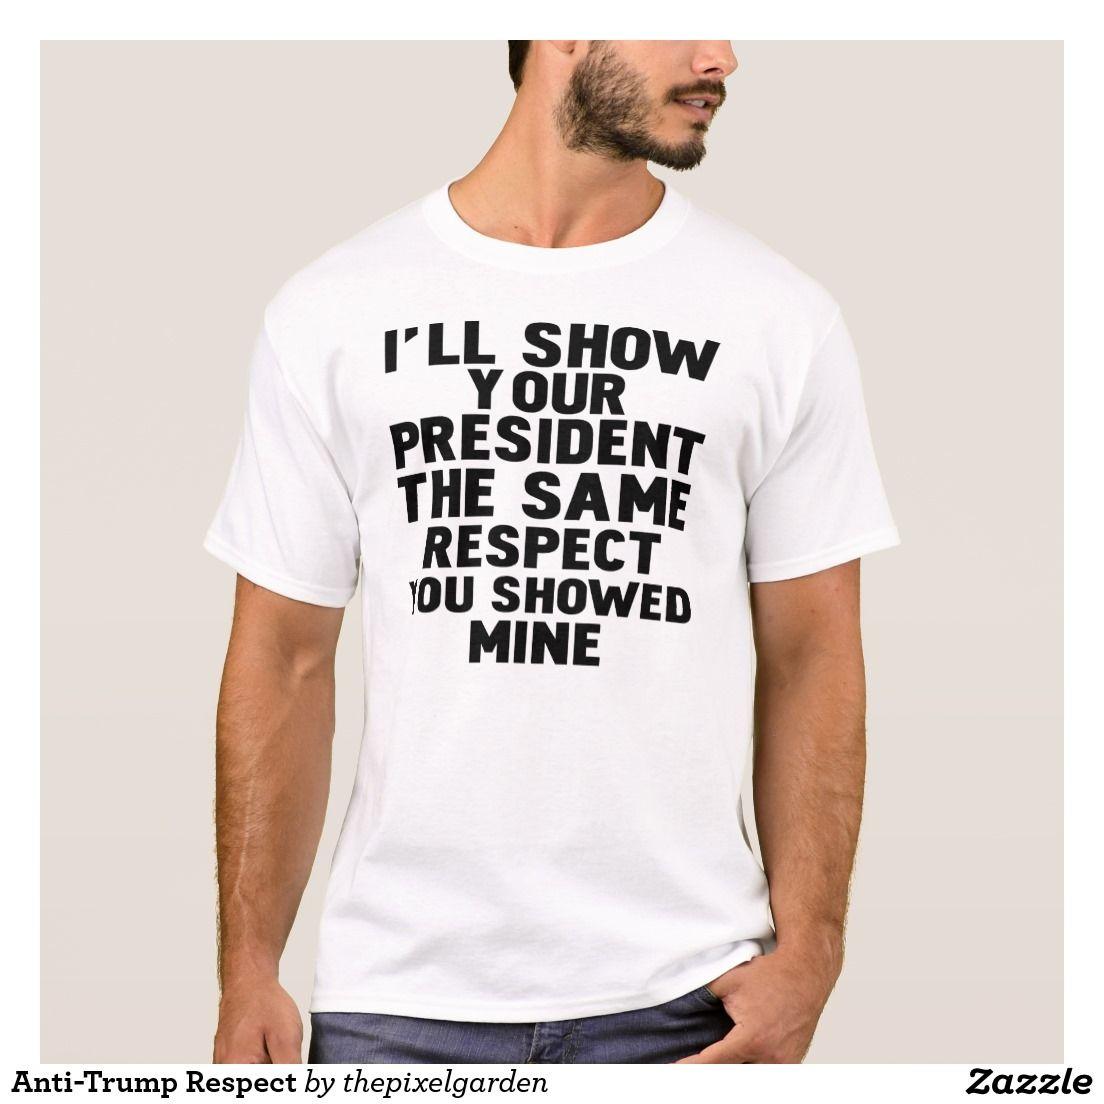 Design t shirt zazzle - Anti Trump Respect T Shirt A Funny Political Design That Says I